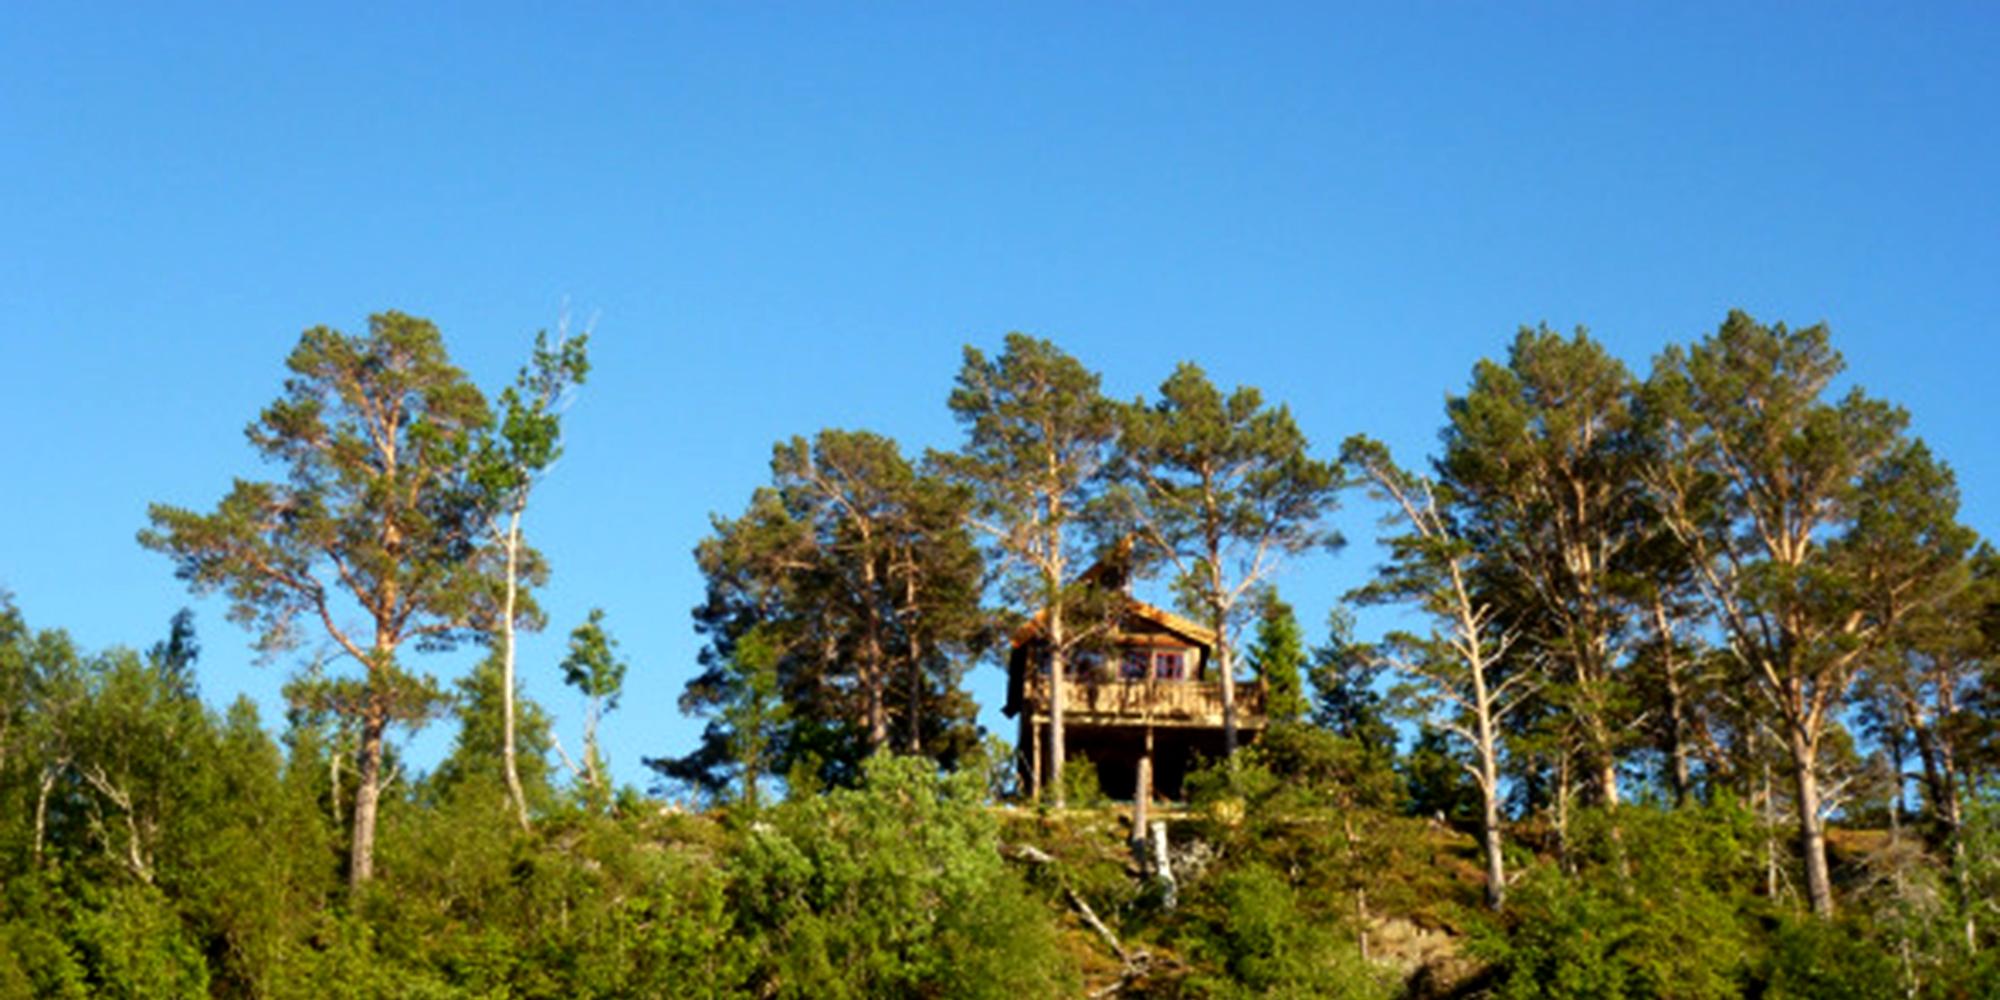 Spettspiret cabin at Letnes Farm viewed from a distance. Copyright: Letnes Gård